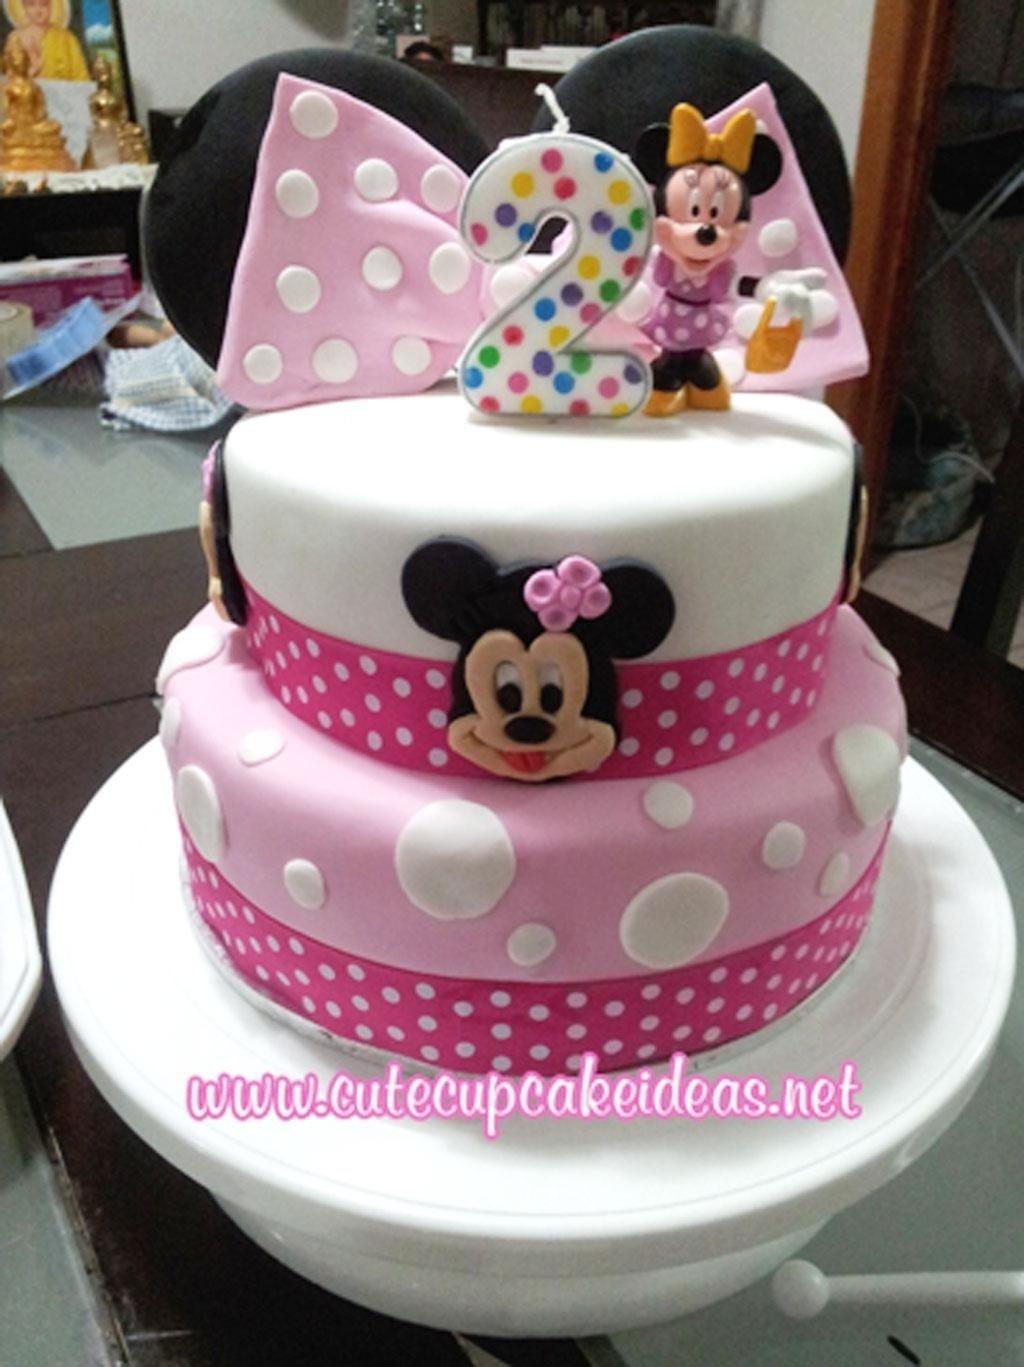 10 Ideal Minnie Mouse Birthday Cake Ideas minnie mouse birthday cupcake ideas birthday cake cake ideas